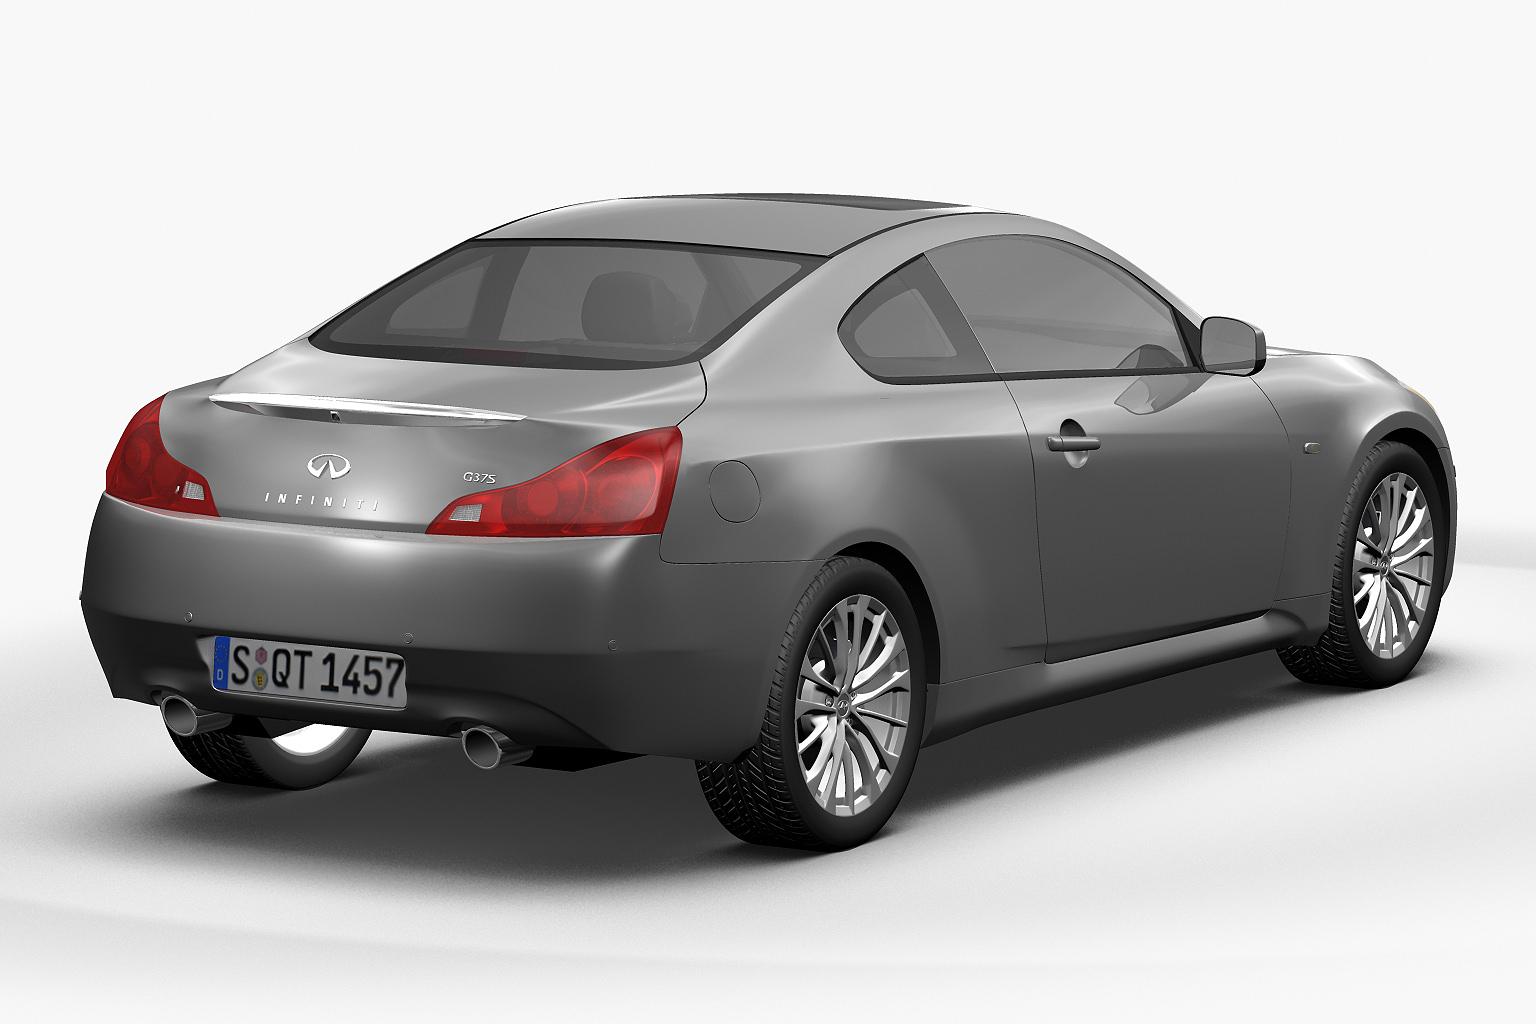 2012 infiniti g37 coupe 3d model max obj 3ds fbx lwo lw lws hrc xsi. Black Bedroom Furniture Sets. Home Design Ideas